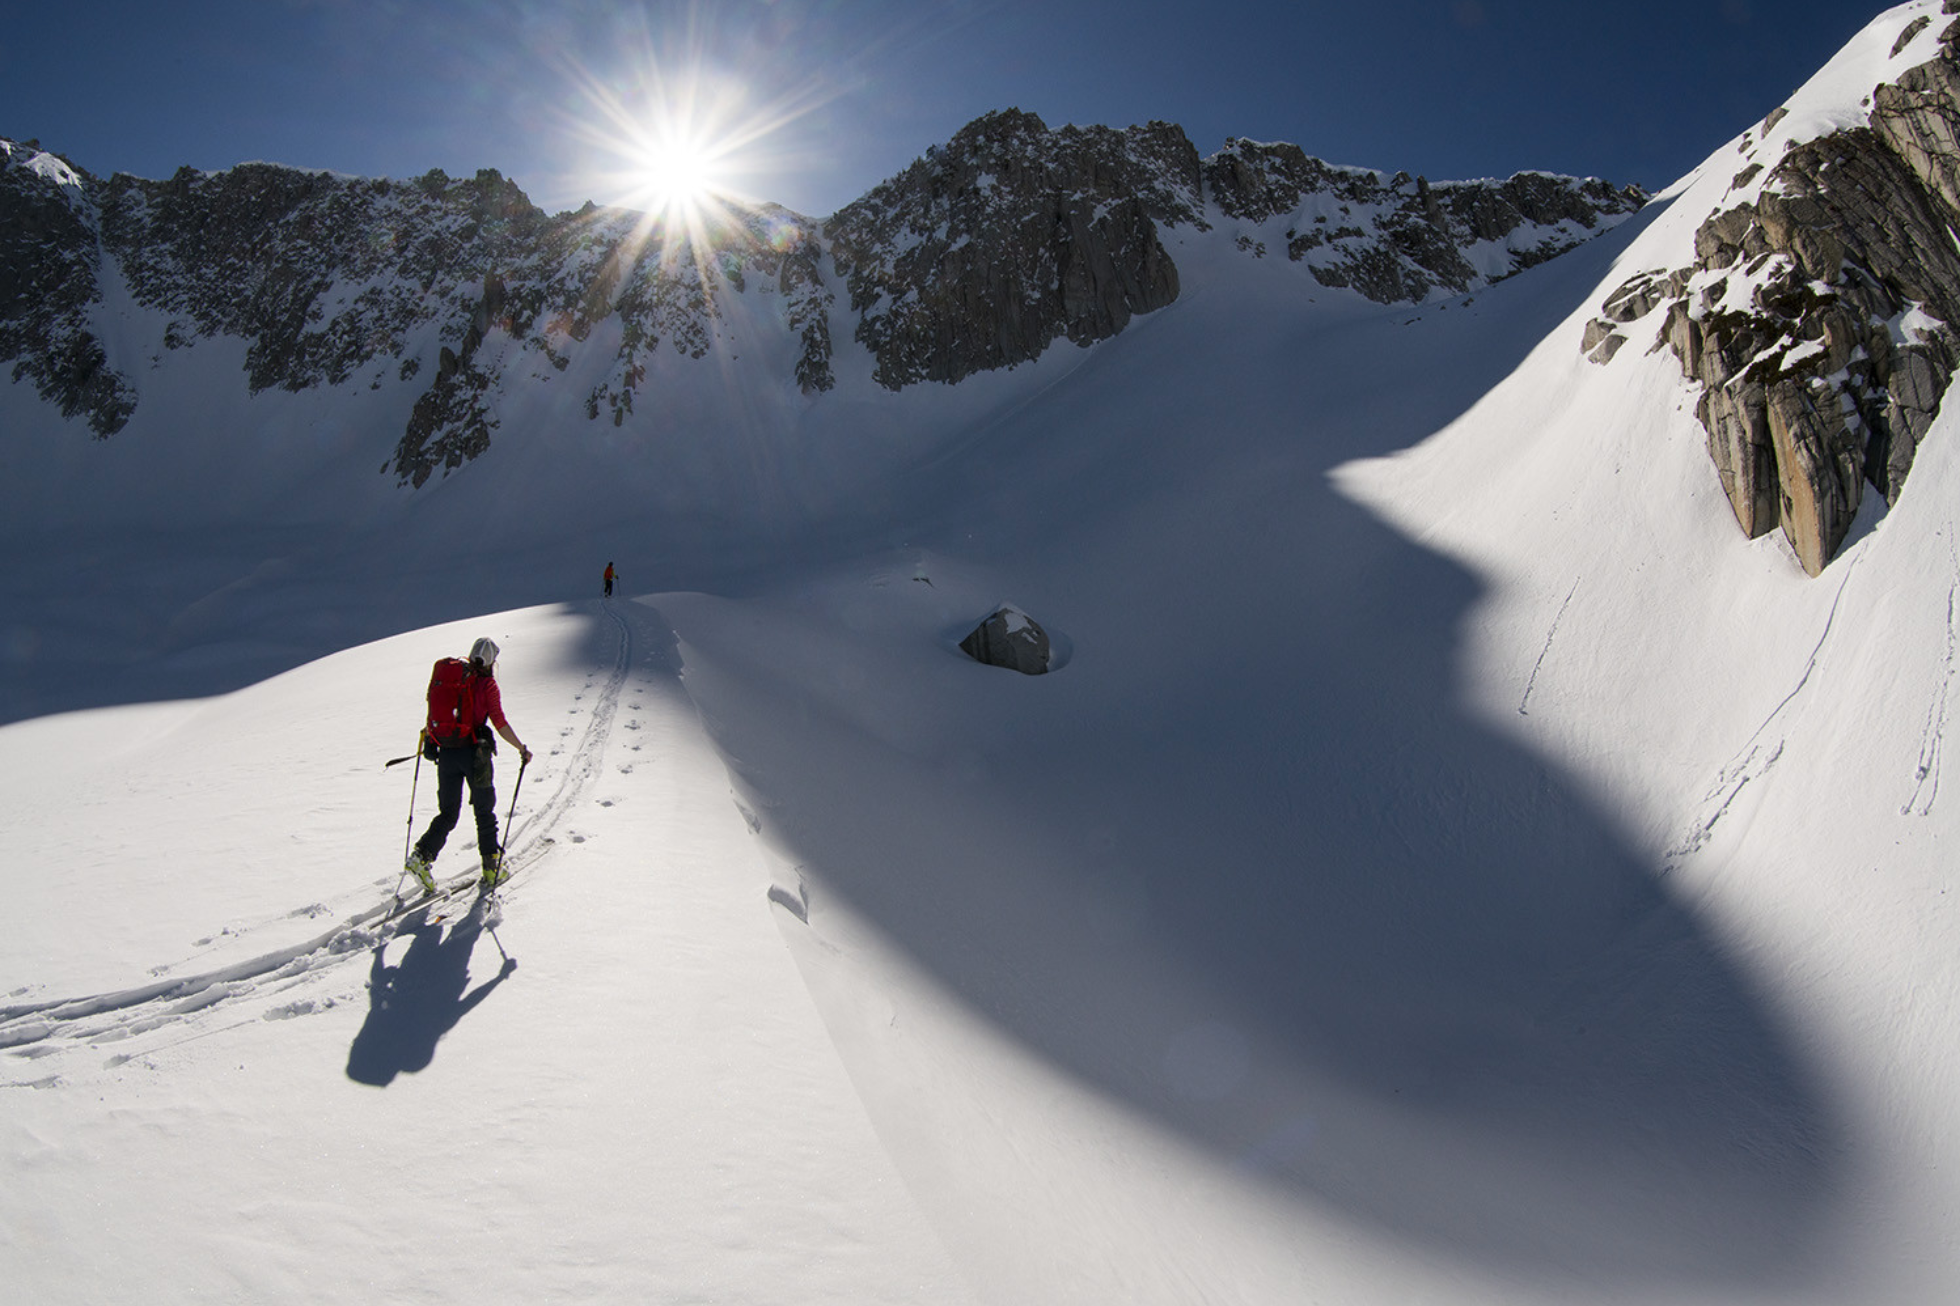 female athlete skier Caroline Gleich follow through